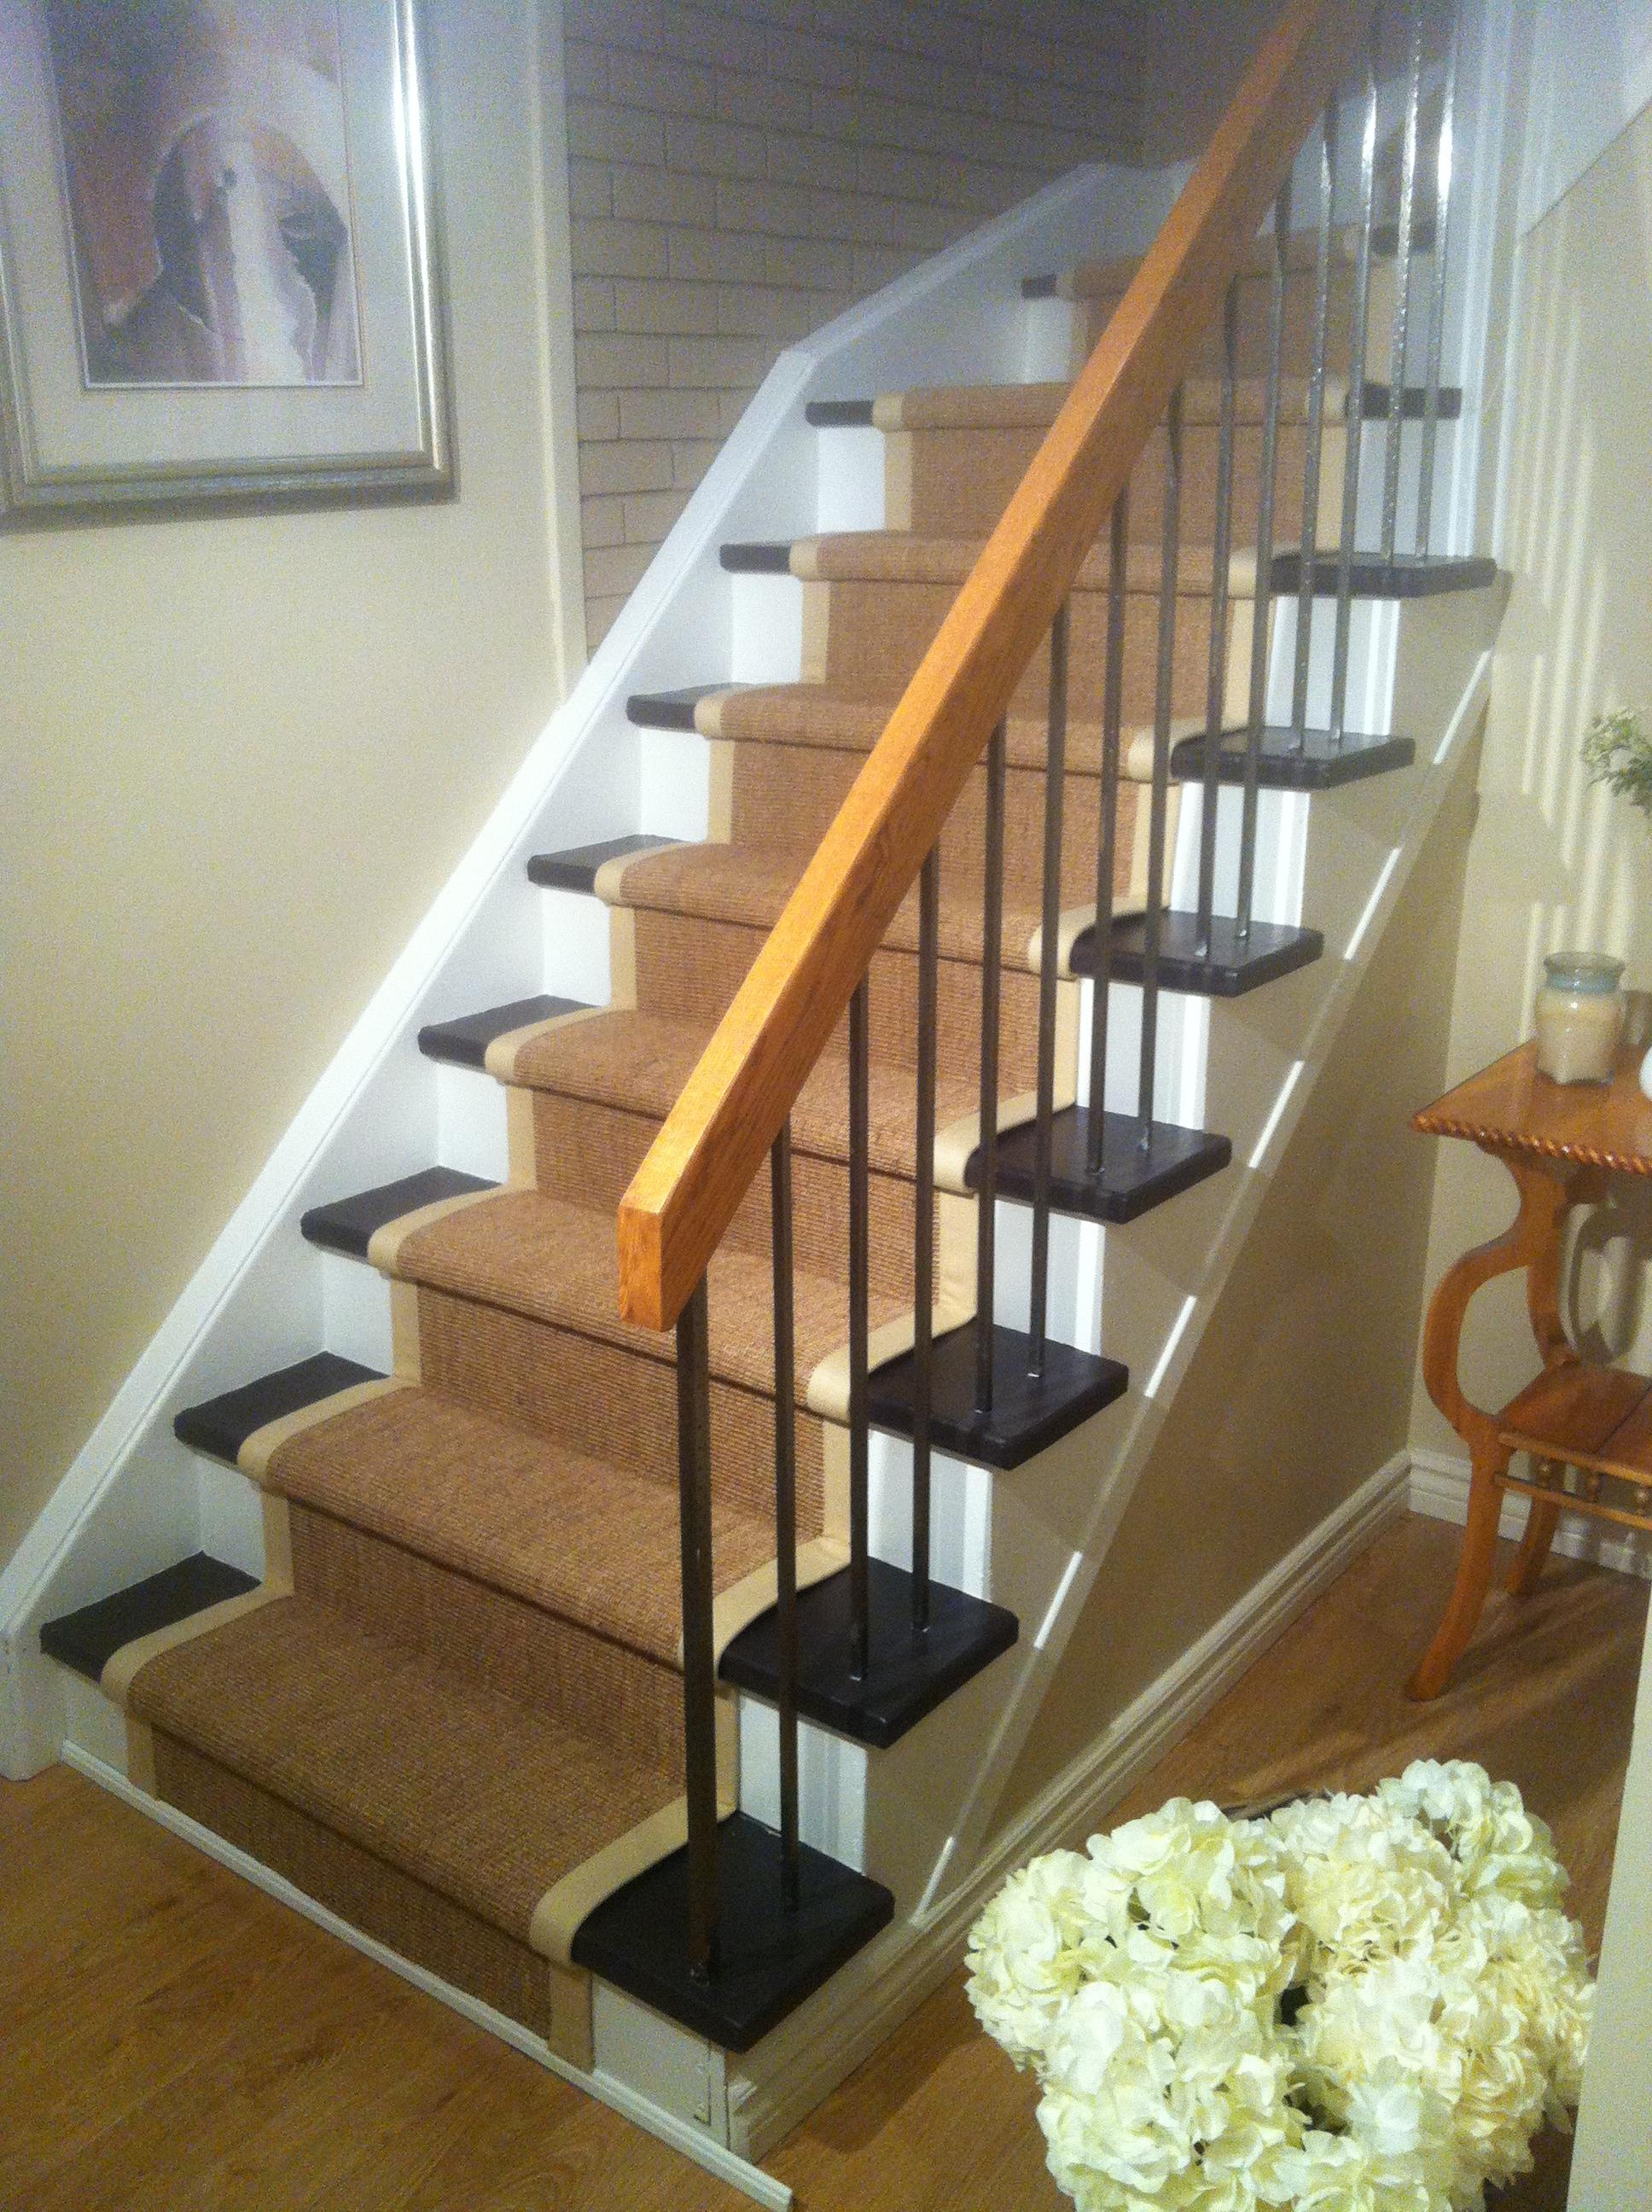 Natural Sisal Staircase Carpet Runner Toronto, Ontario, Canada